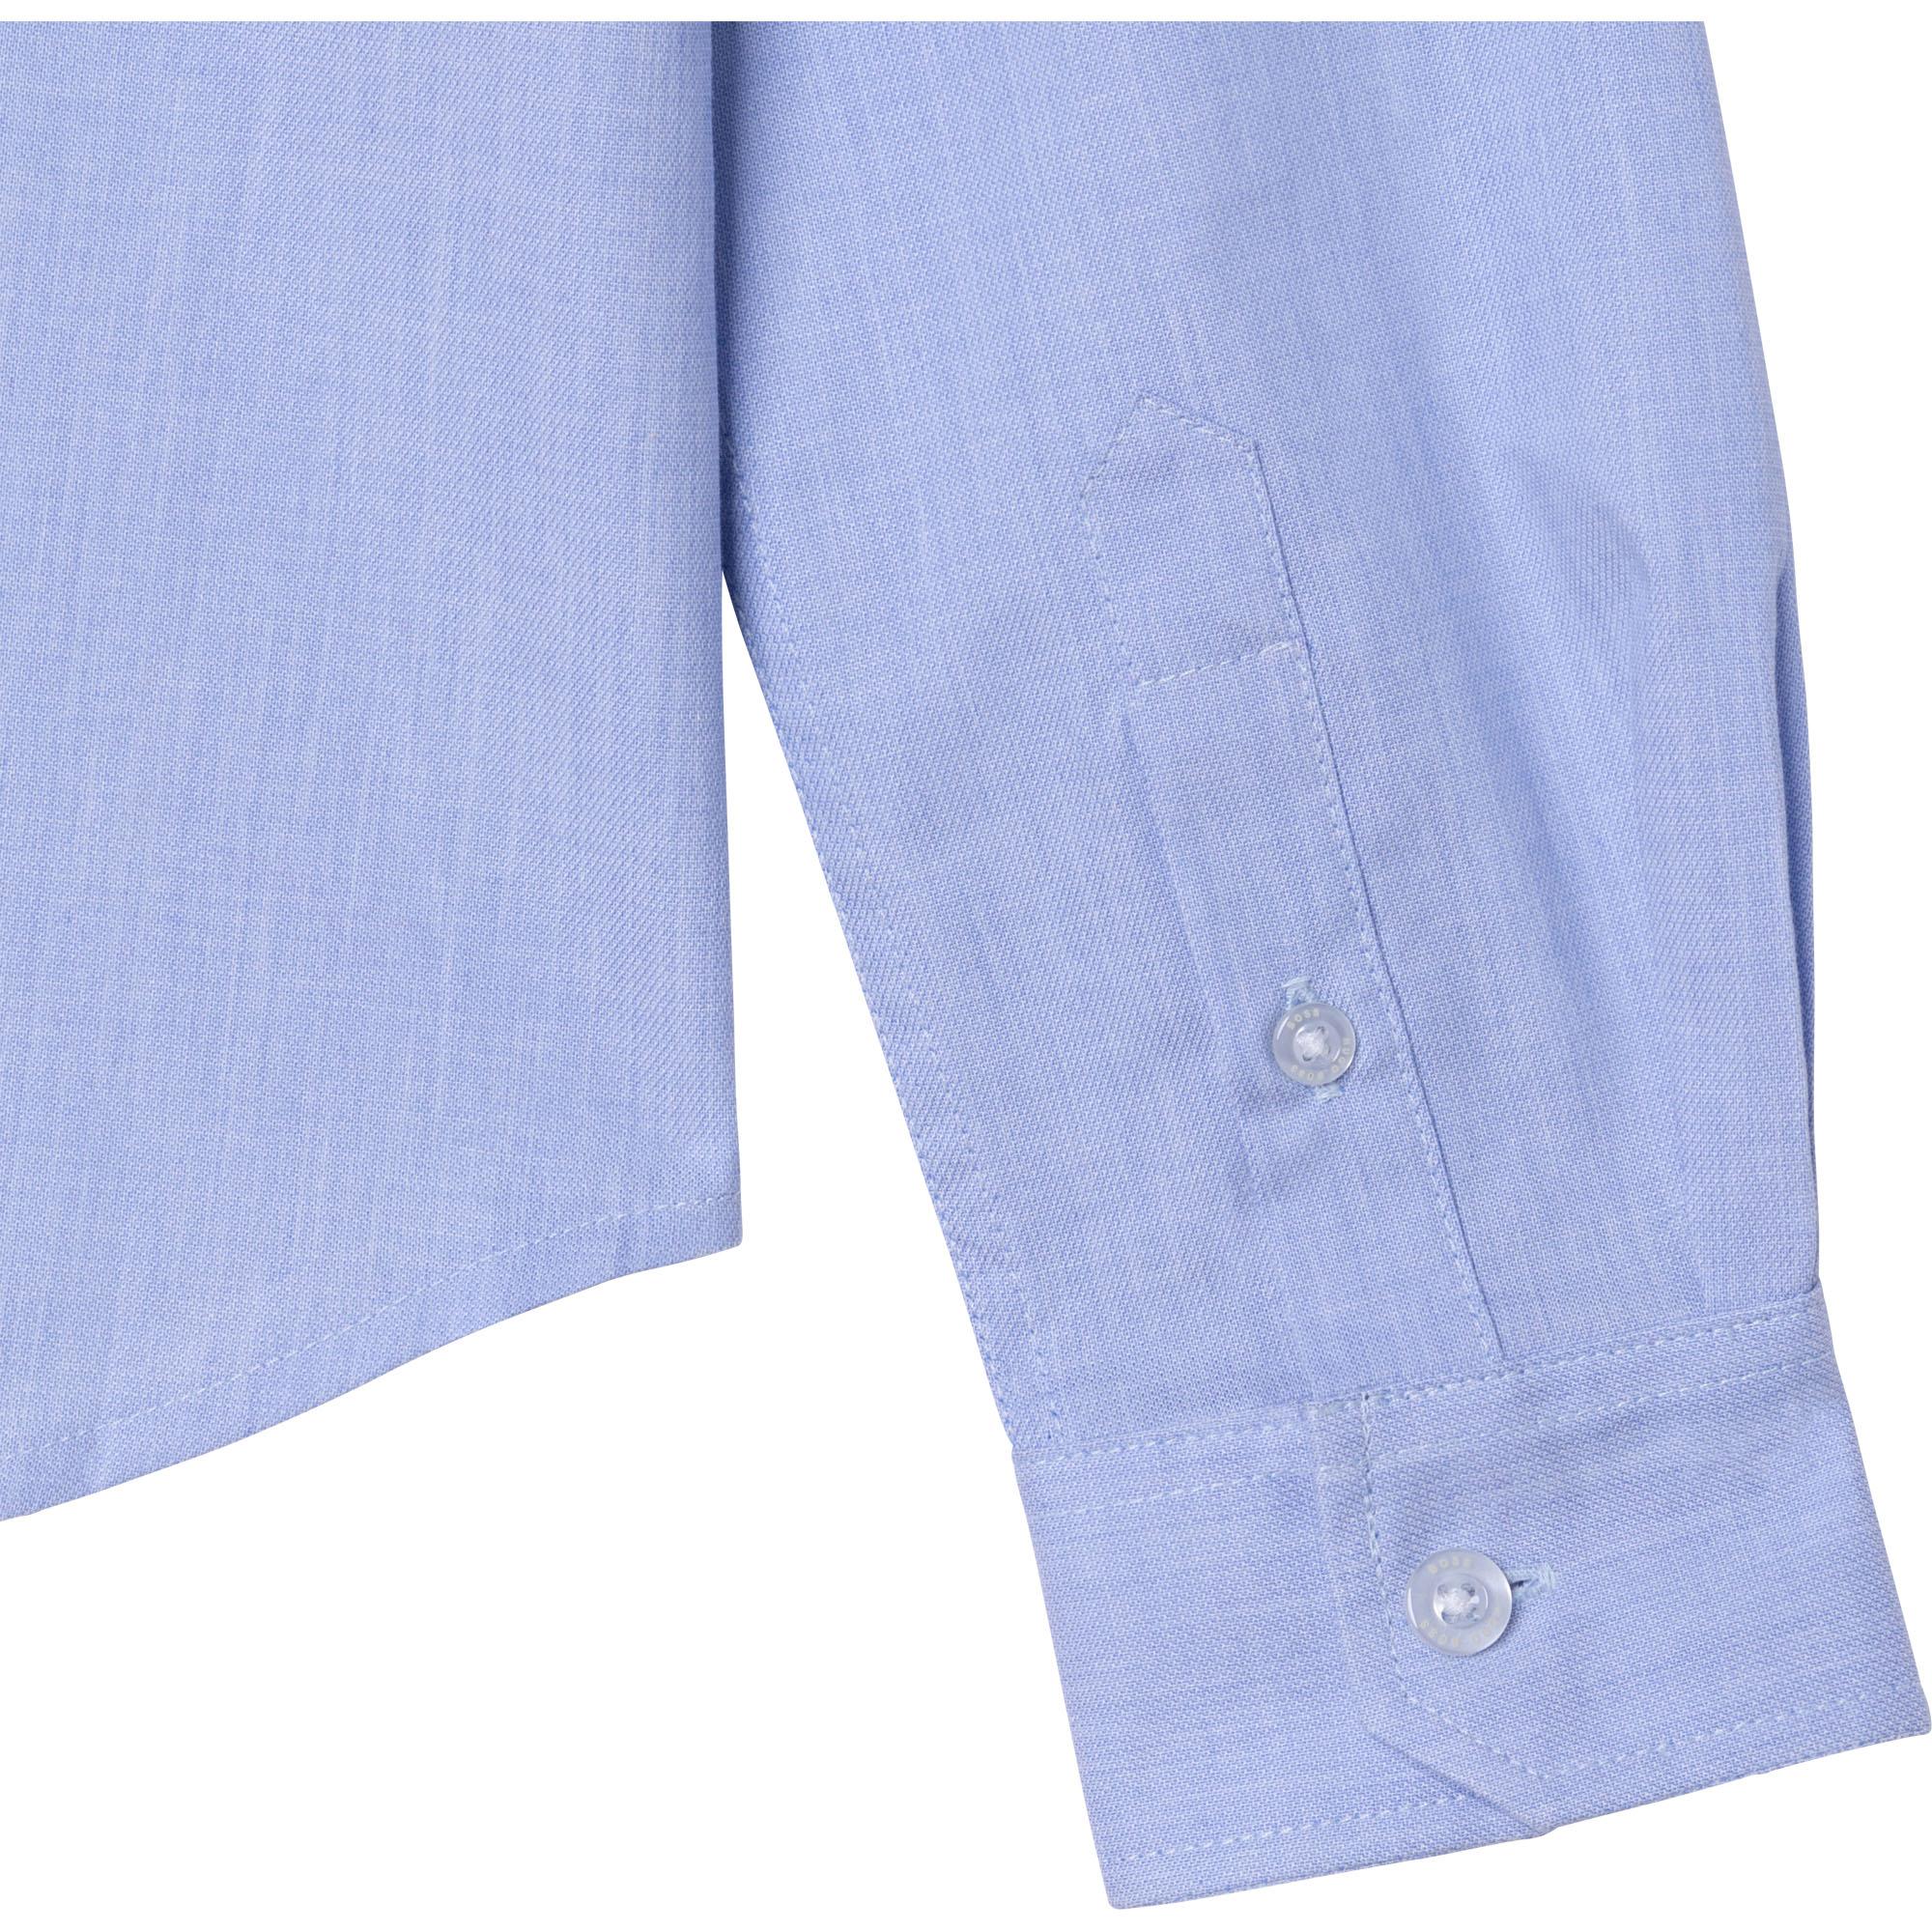 Long-sleeved cotton shirt BOSS for BOY